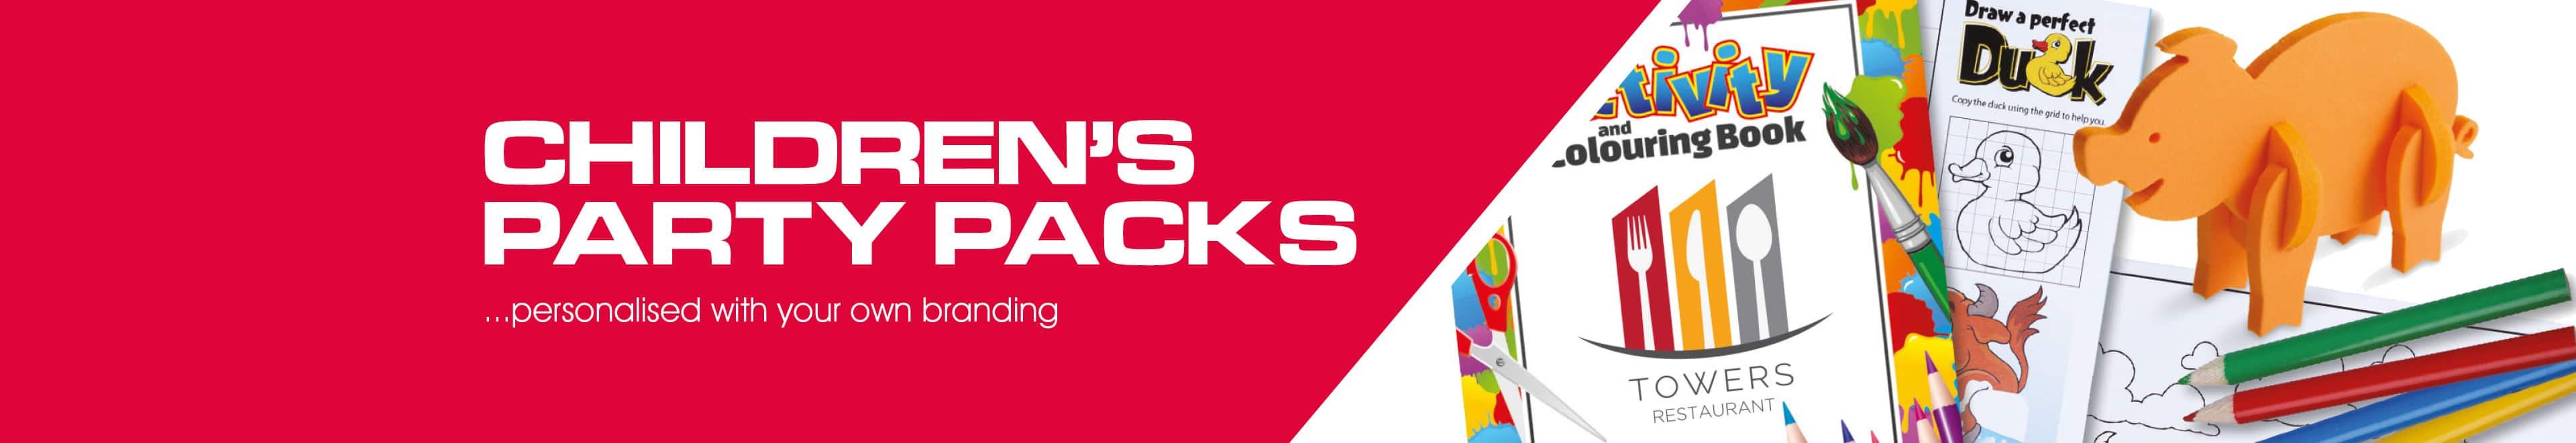 Children's Activity Packs banner